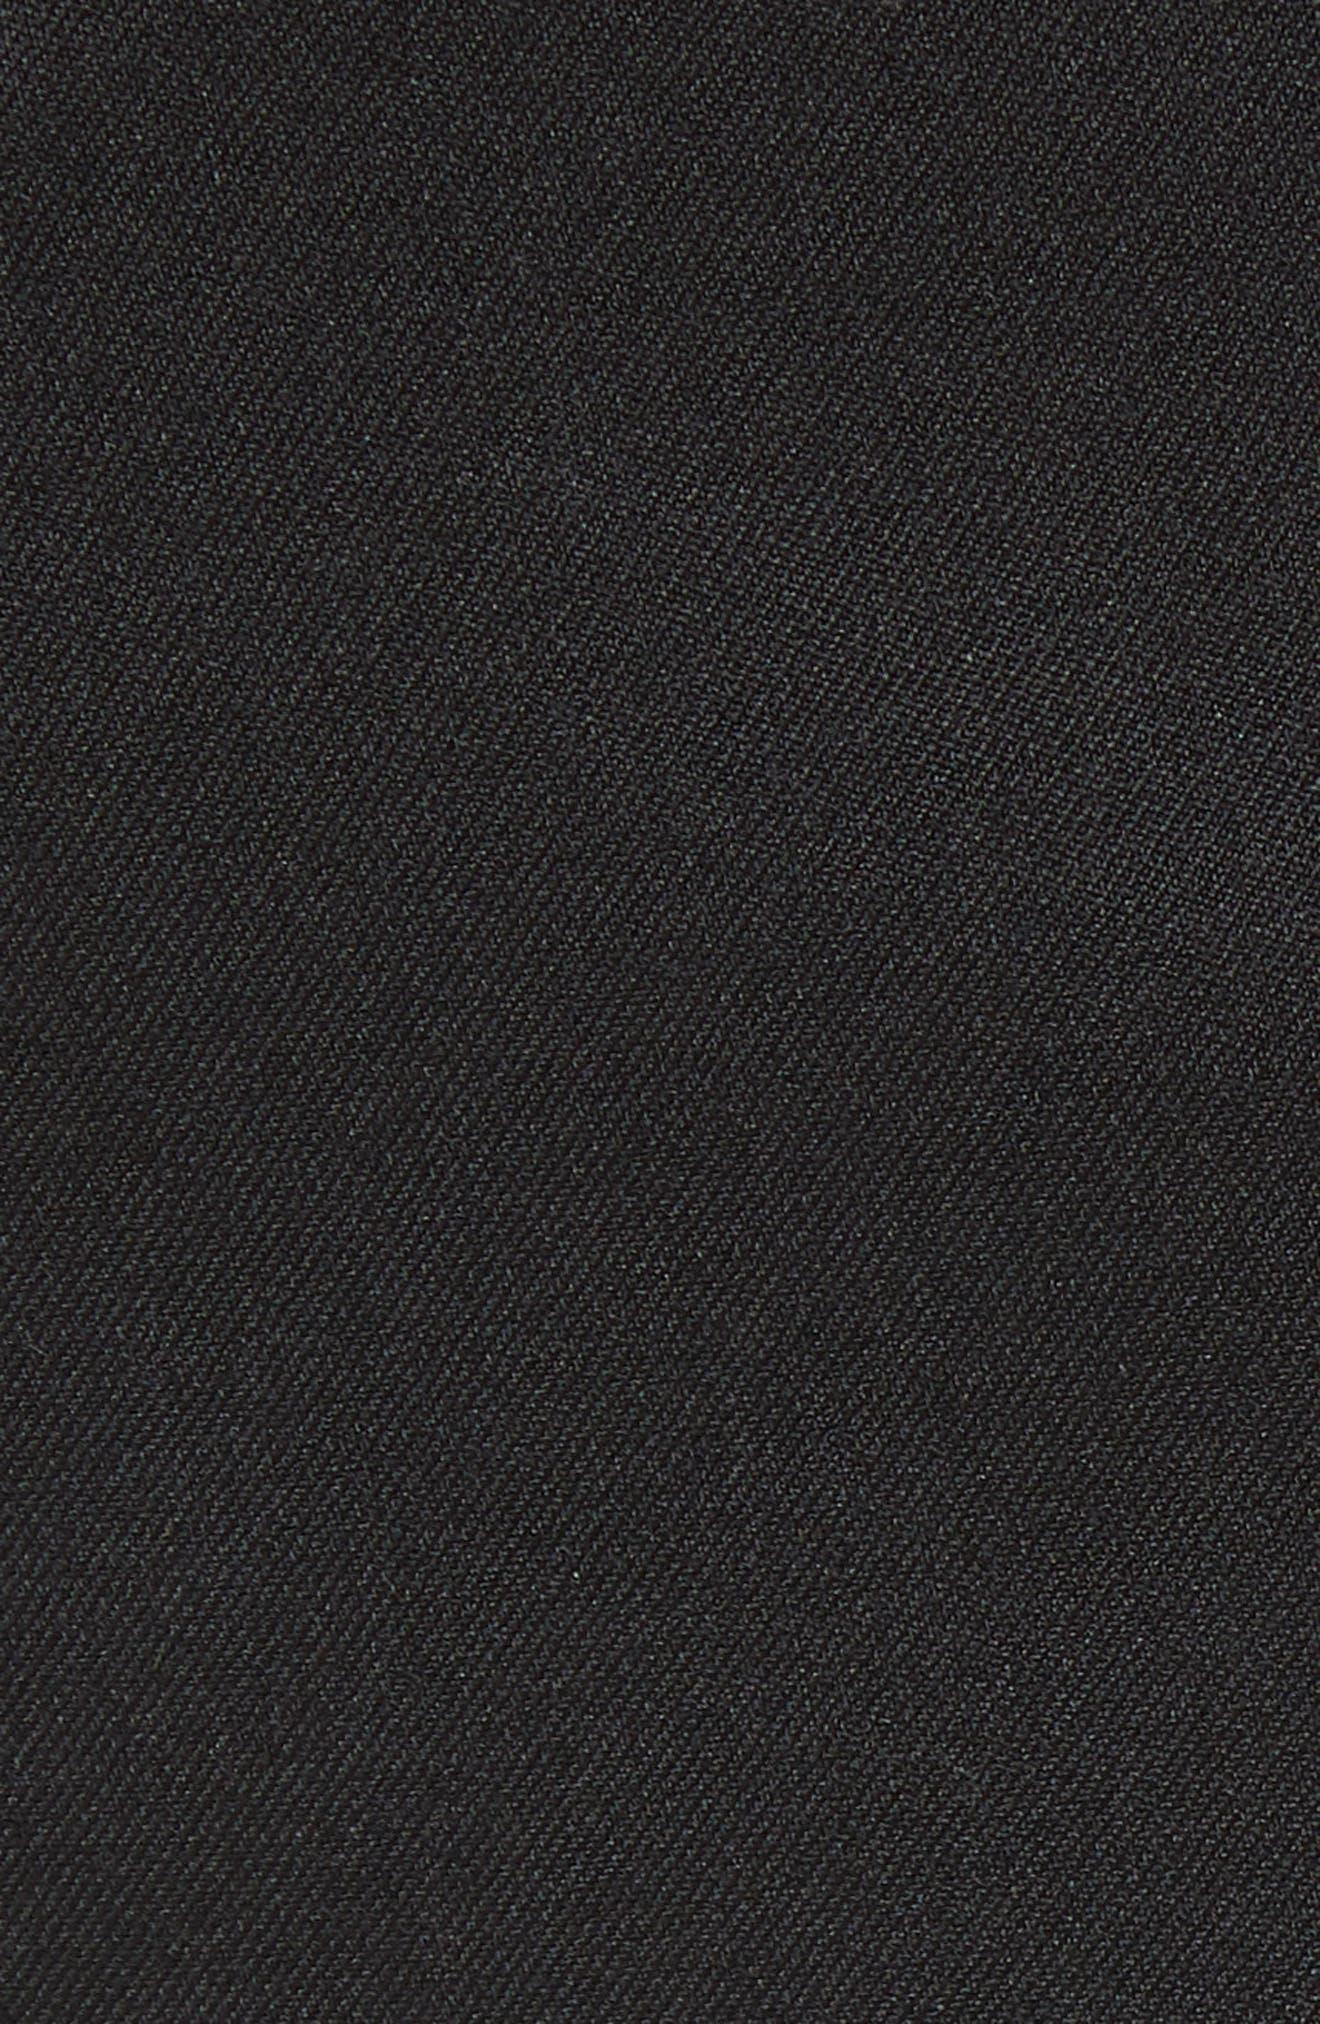 Flat Front Tech-Smart Extra Trim Trousers,                             Alternate thumbnail 5, color,                             001